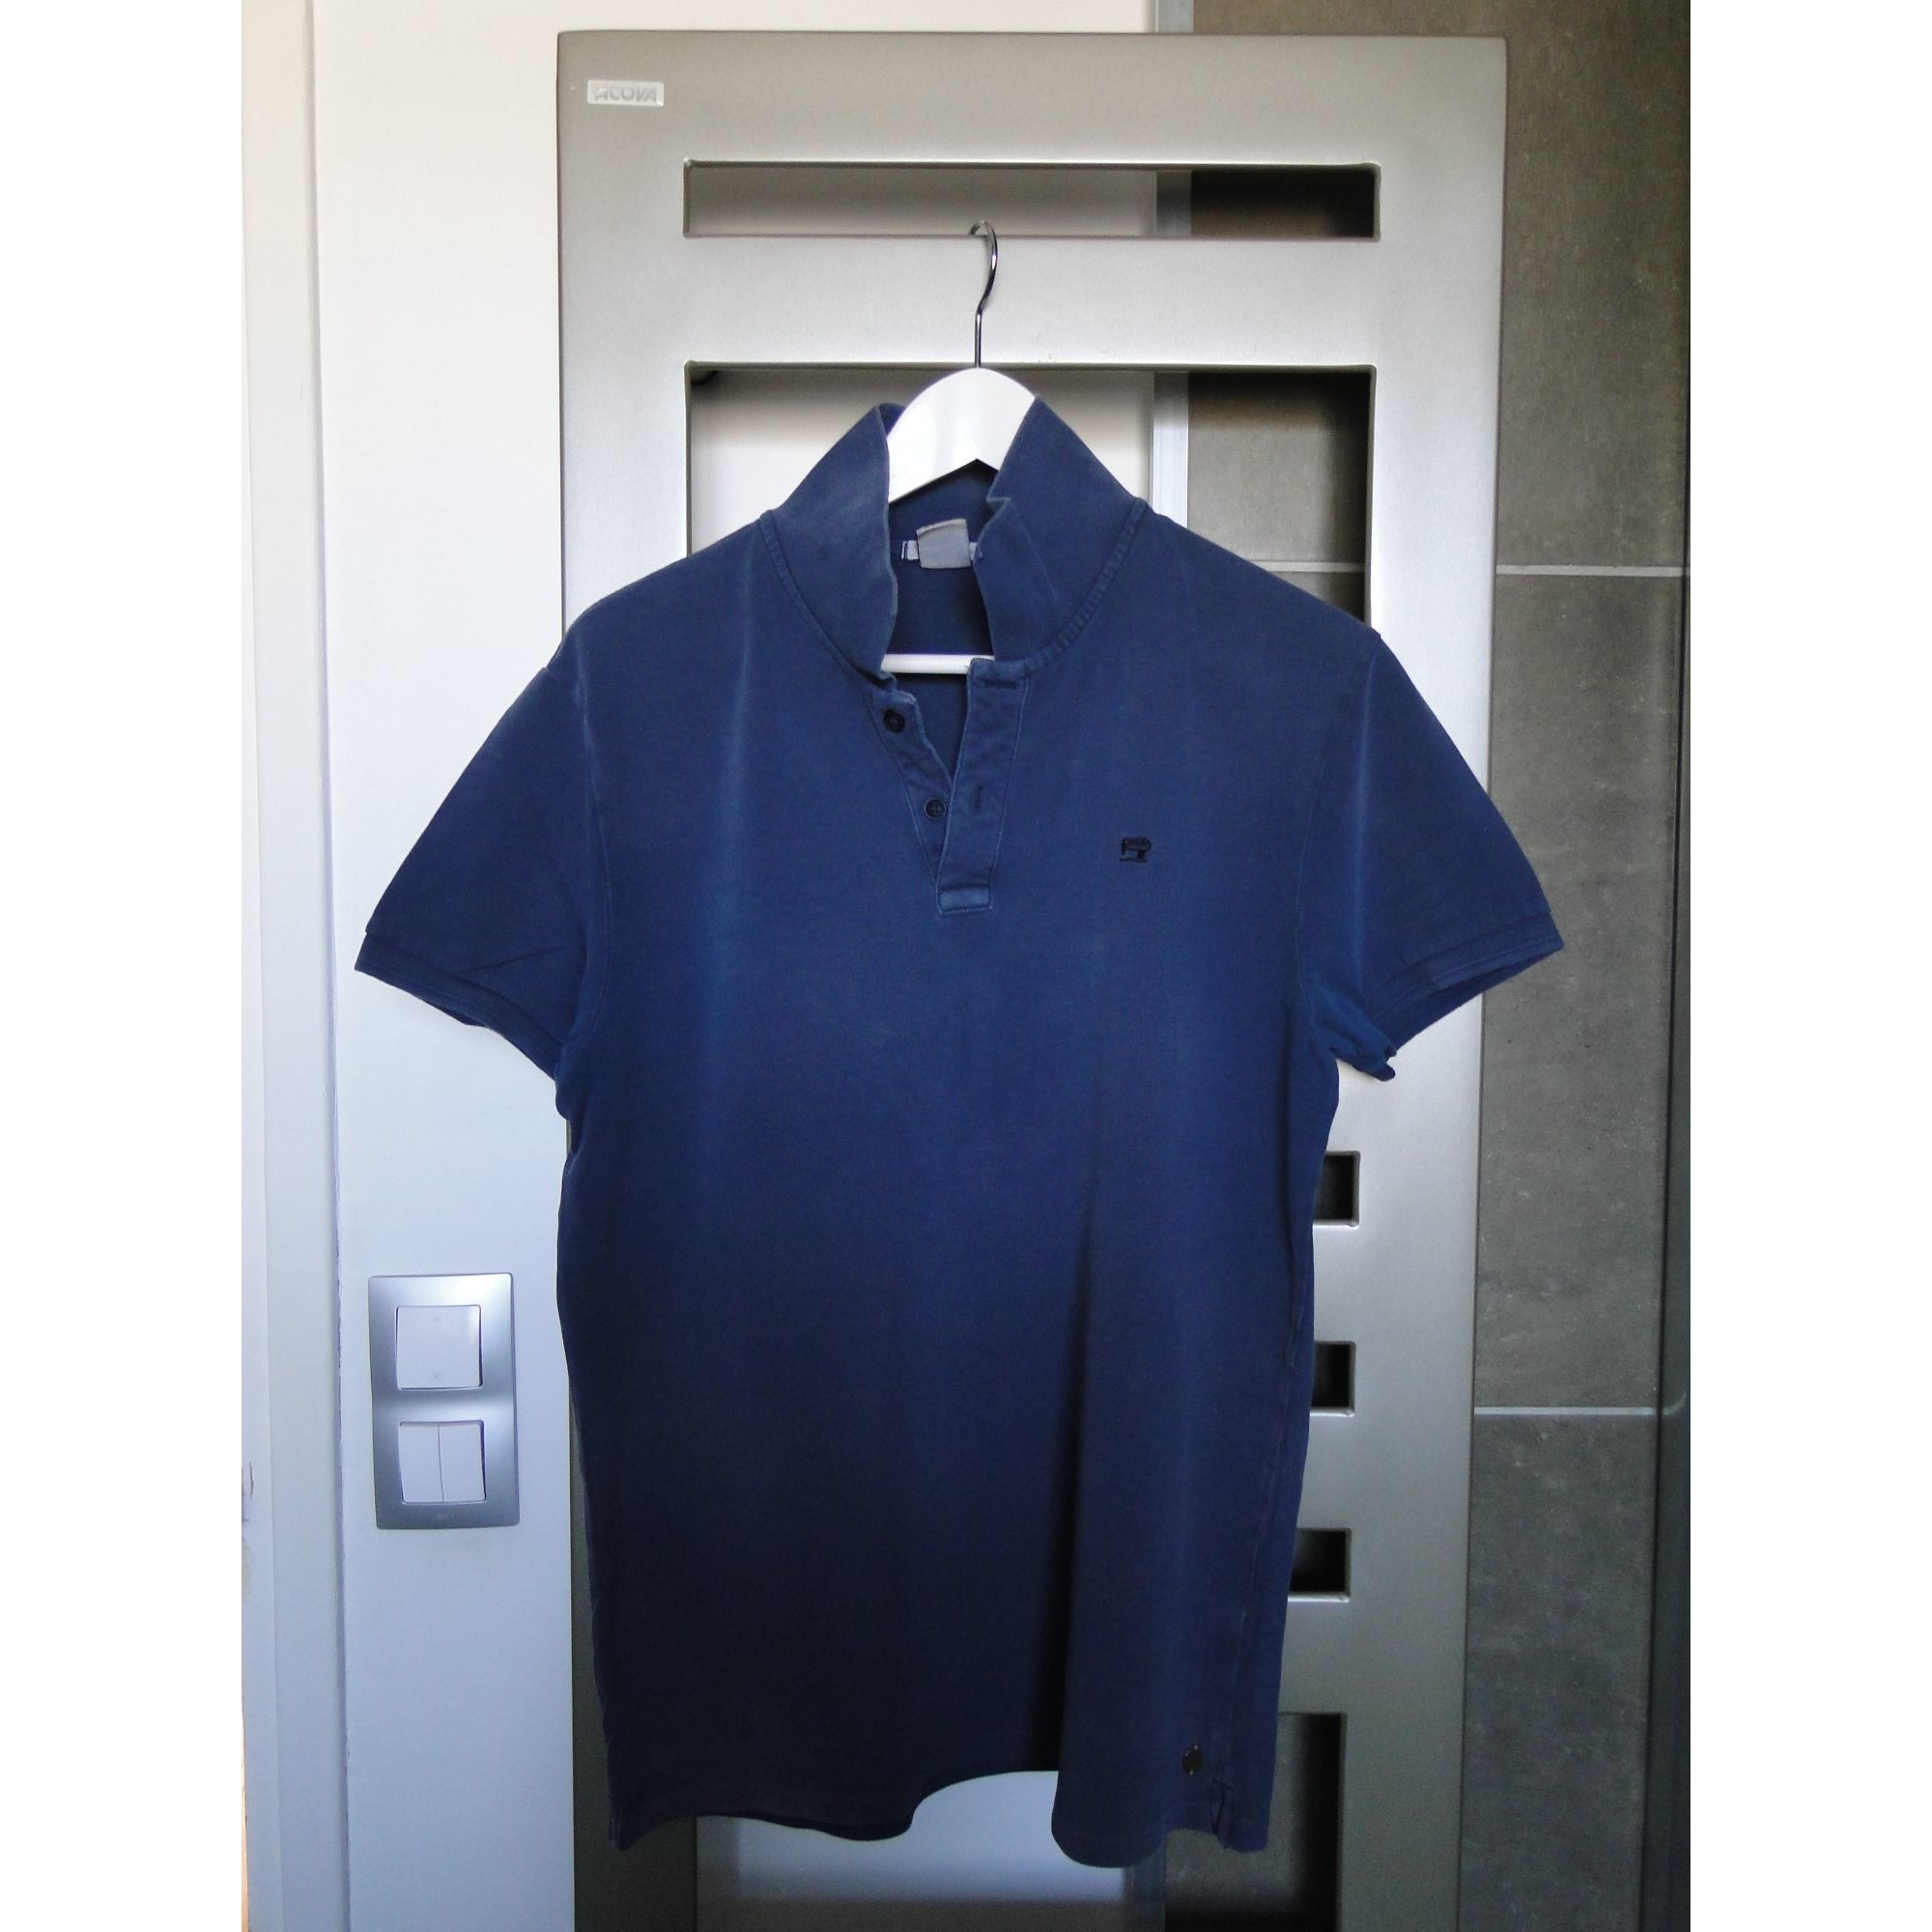 Polo SCOTCH & SODA Bleu, bleu marine, bleu turquoise